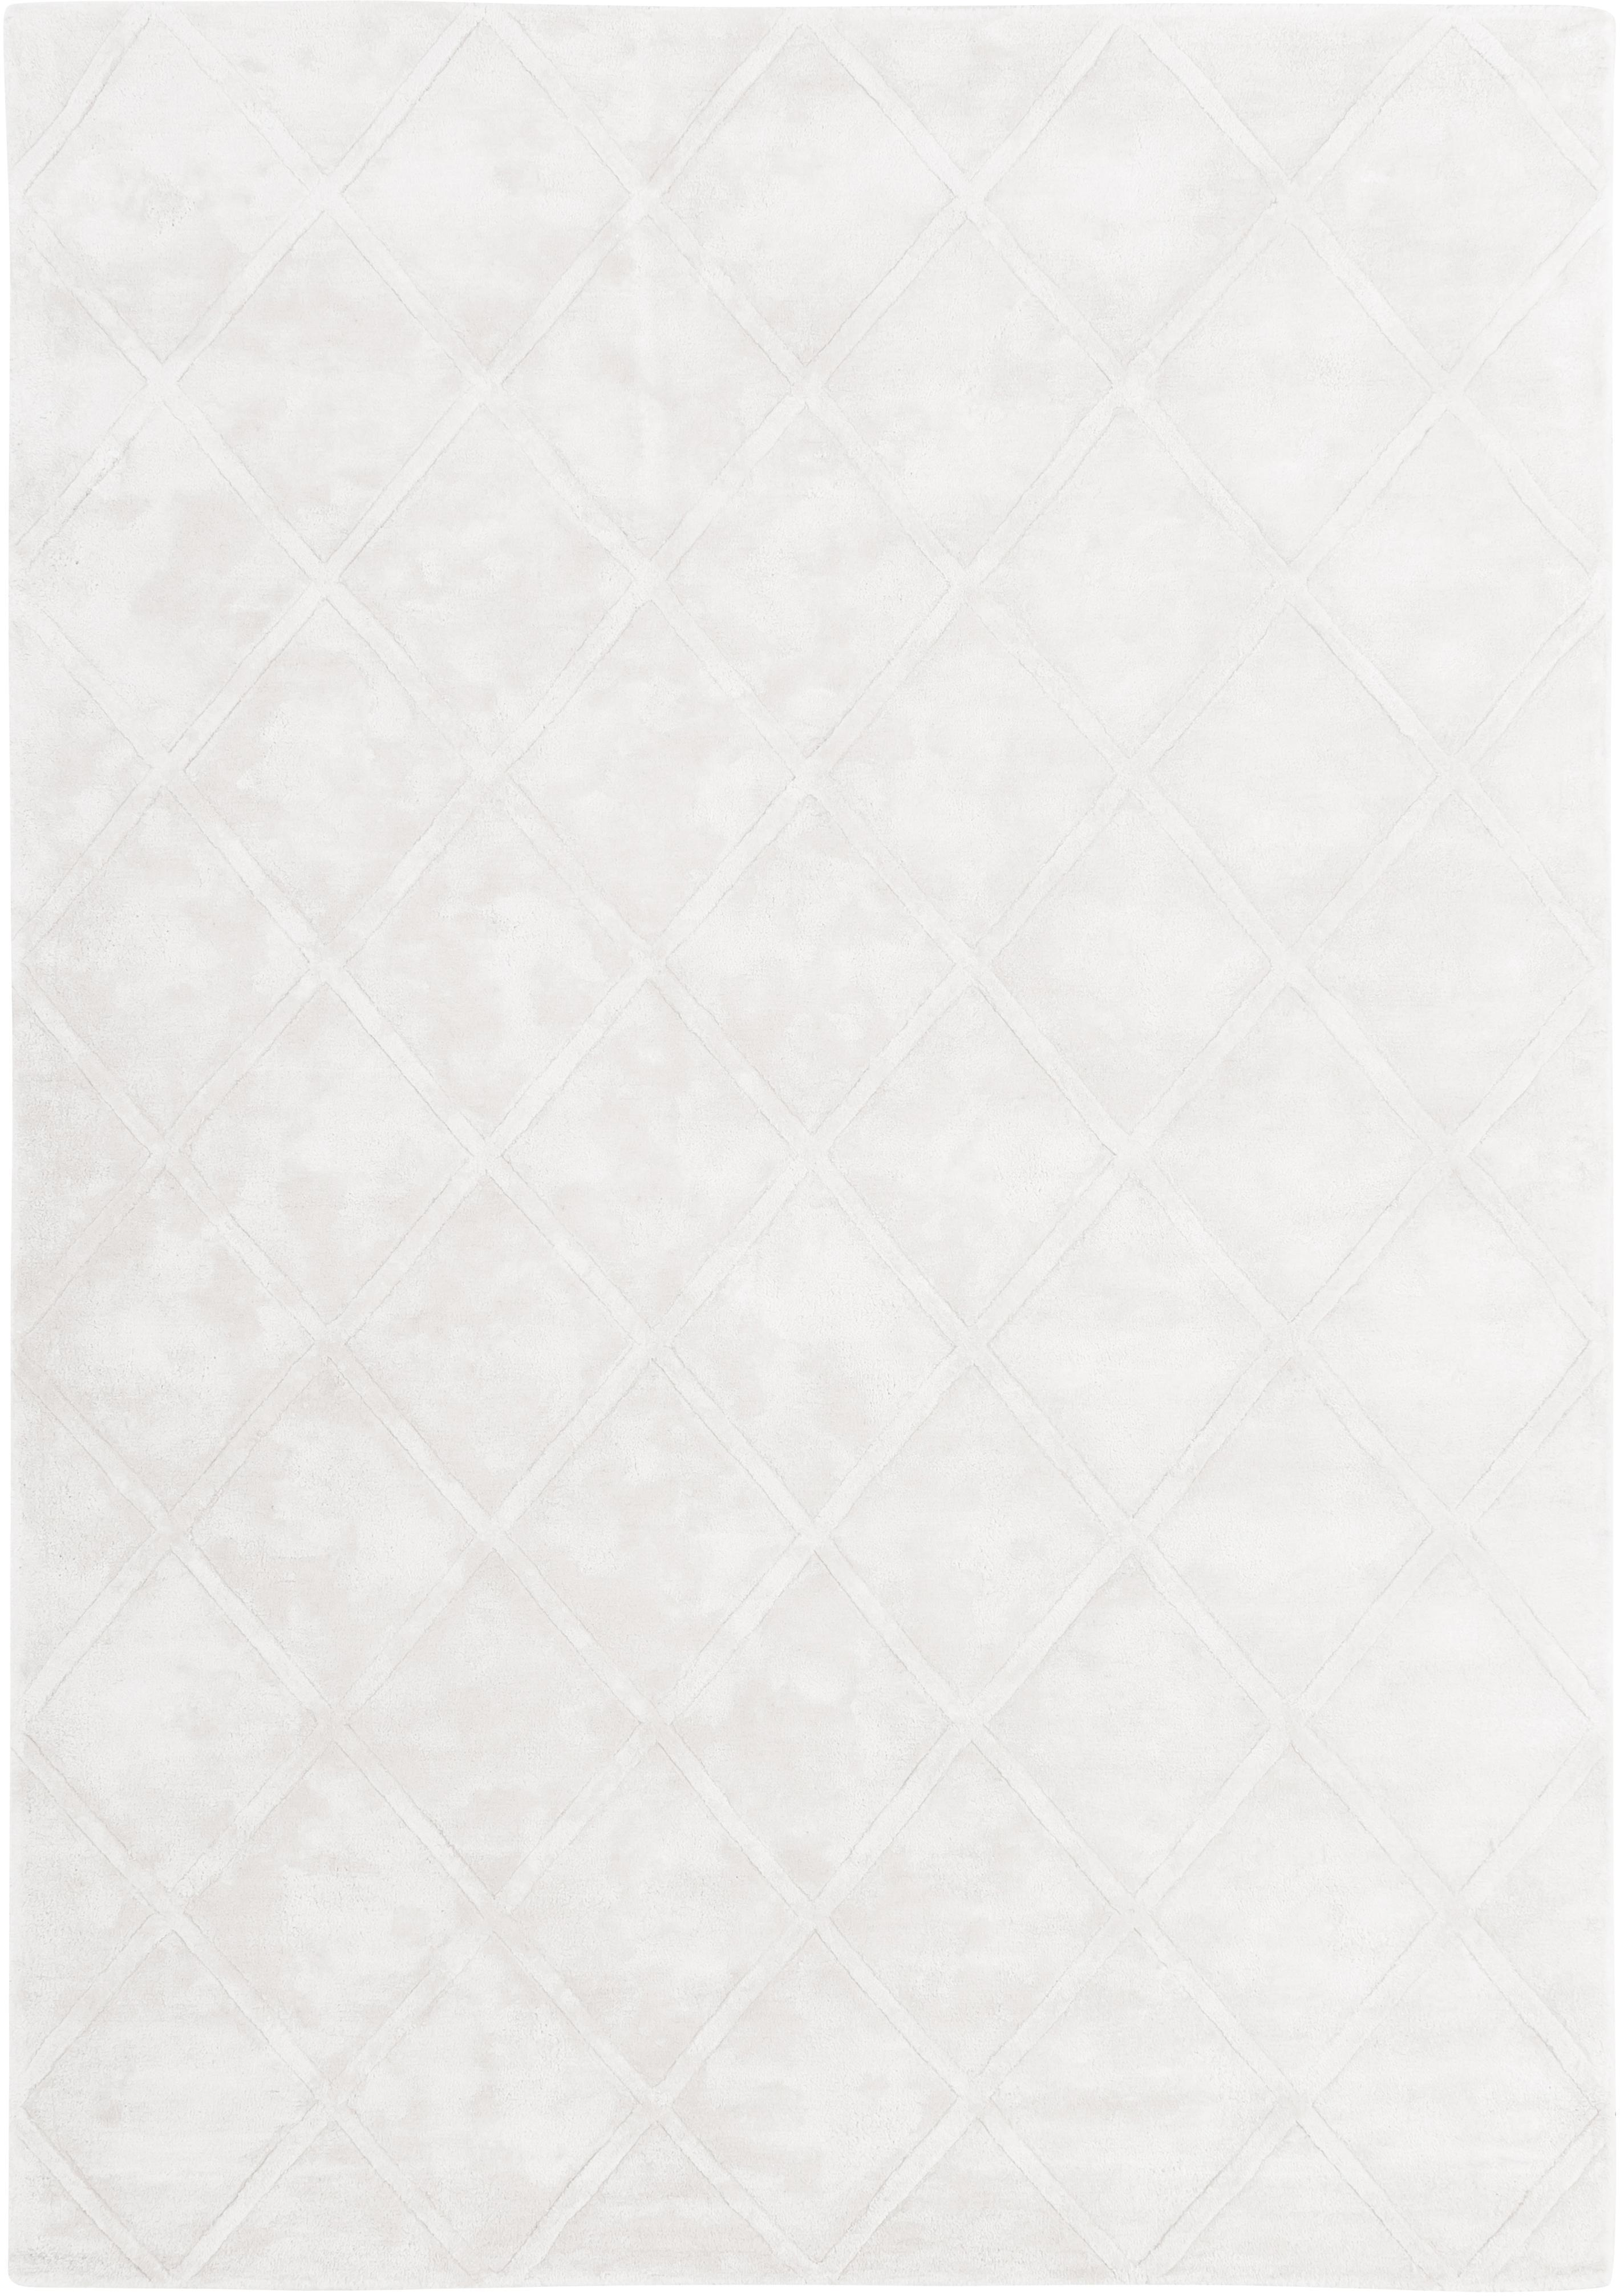 Alfombra artesanal de viscosa Madeleine, Parte superior: 100%viscosa, Reverso: 100%algodón, Crema, An 160 x L 230 cm (Tamaño M)